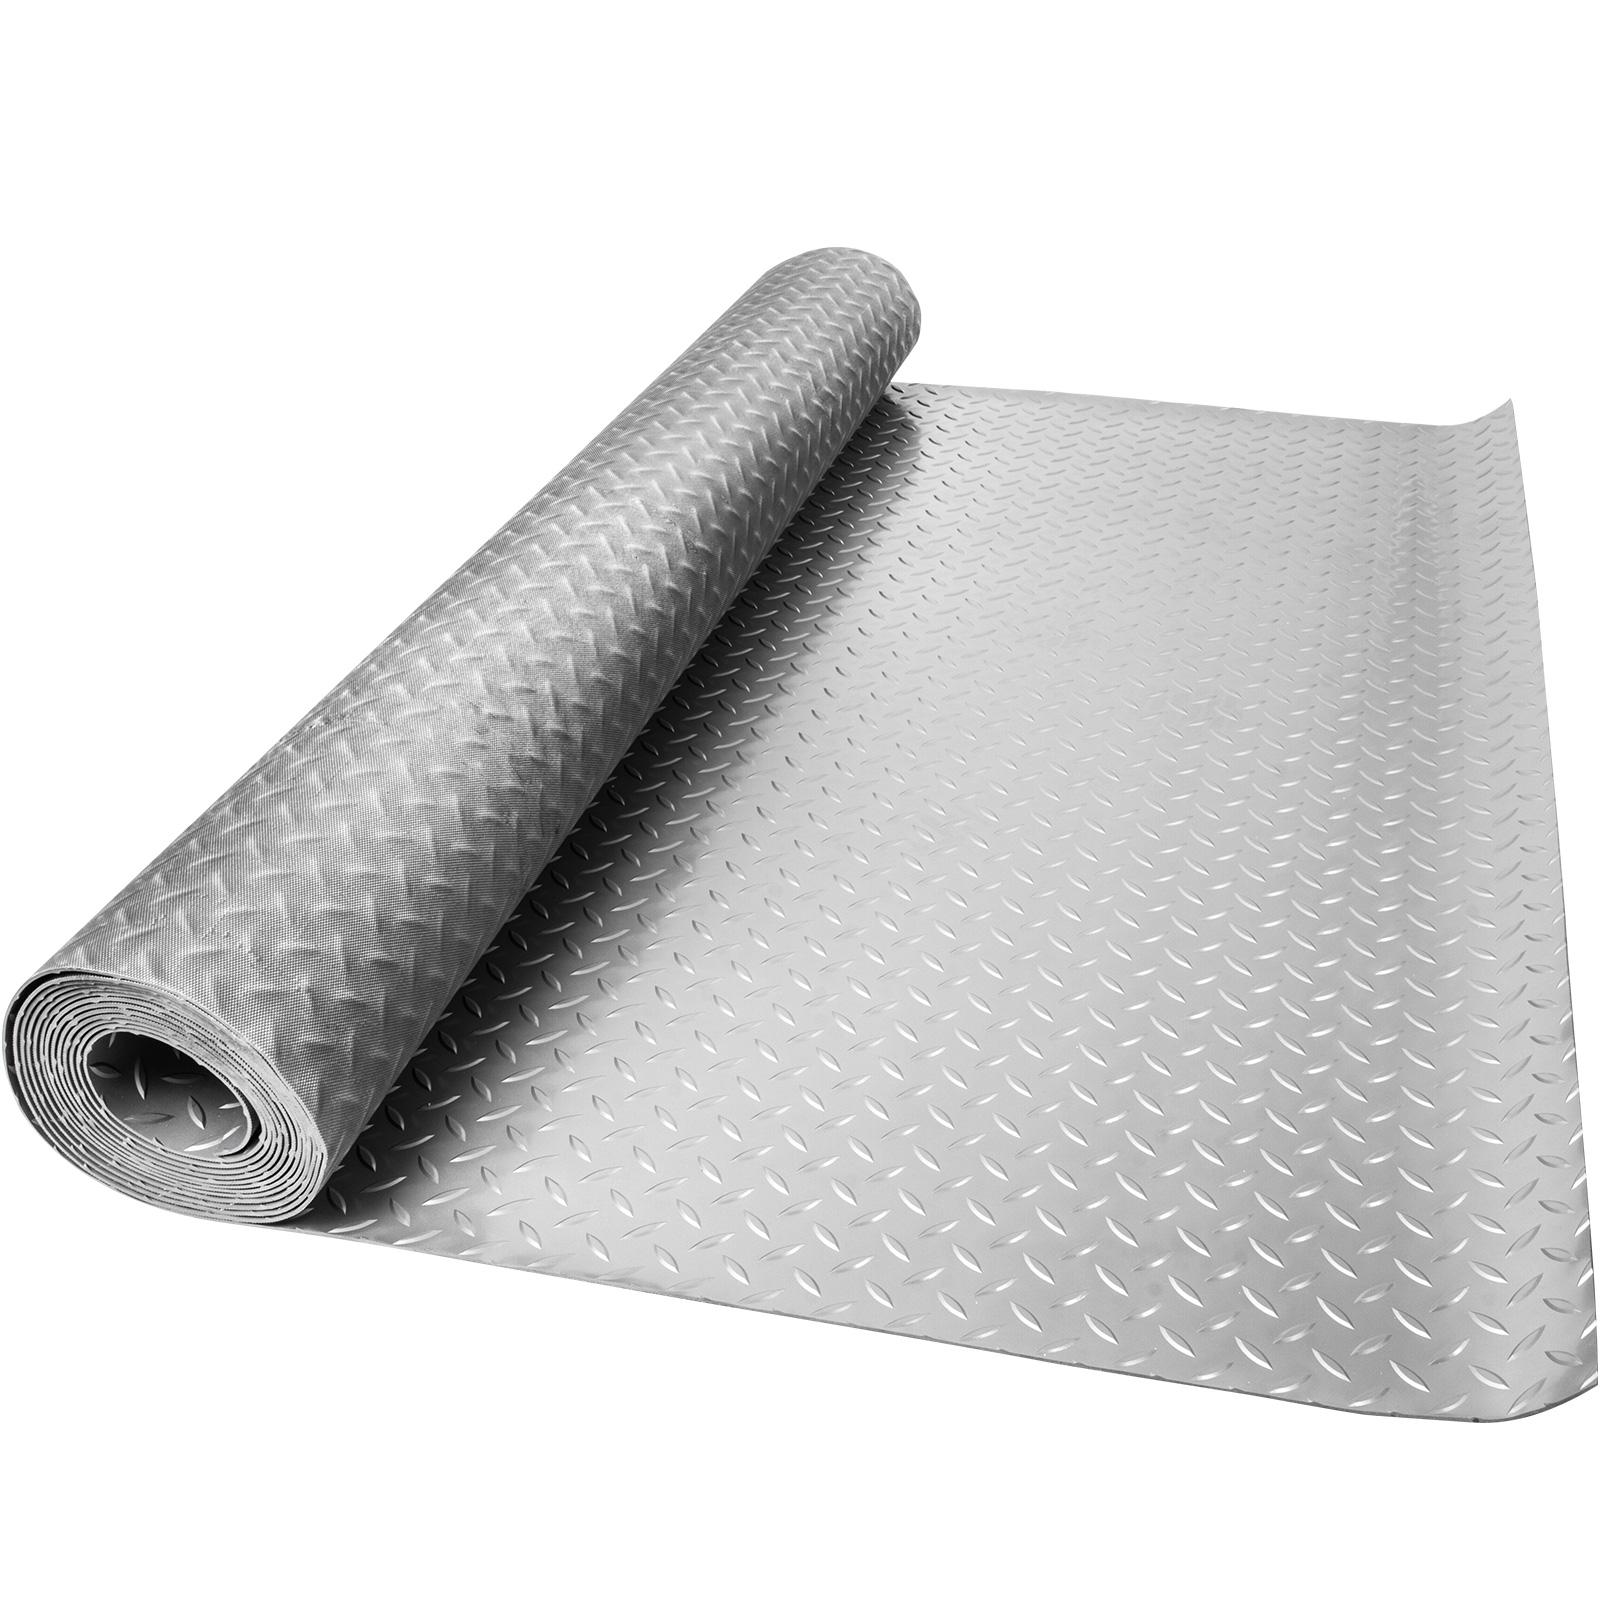 thumbnail 47 - Garage Flooring Mat Roll Car Trailer Floor Covering 1.1m Width Gym Floor Roll